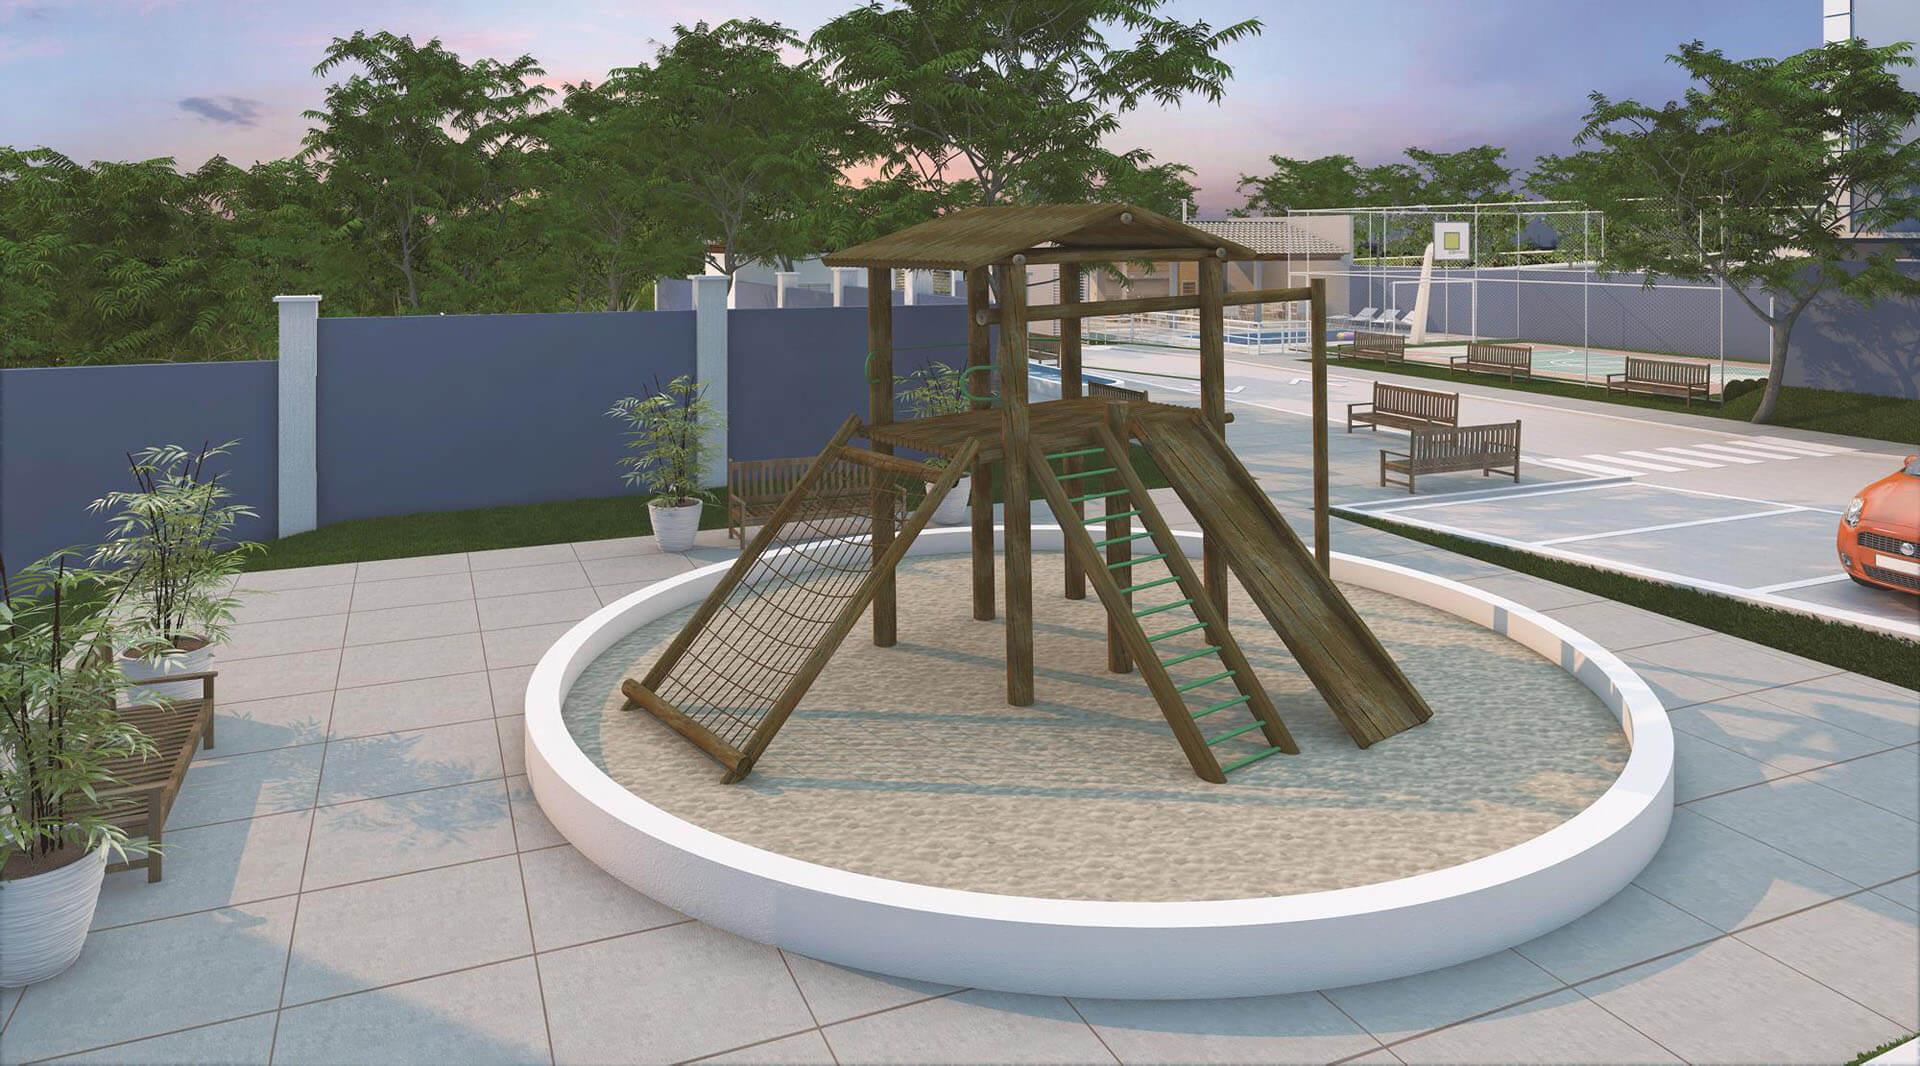 vic-ville-park-collete-playground